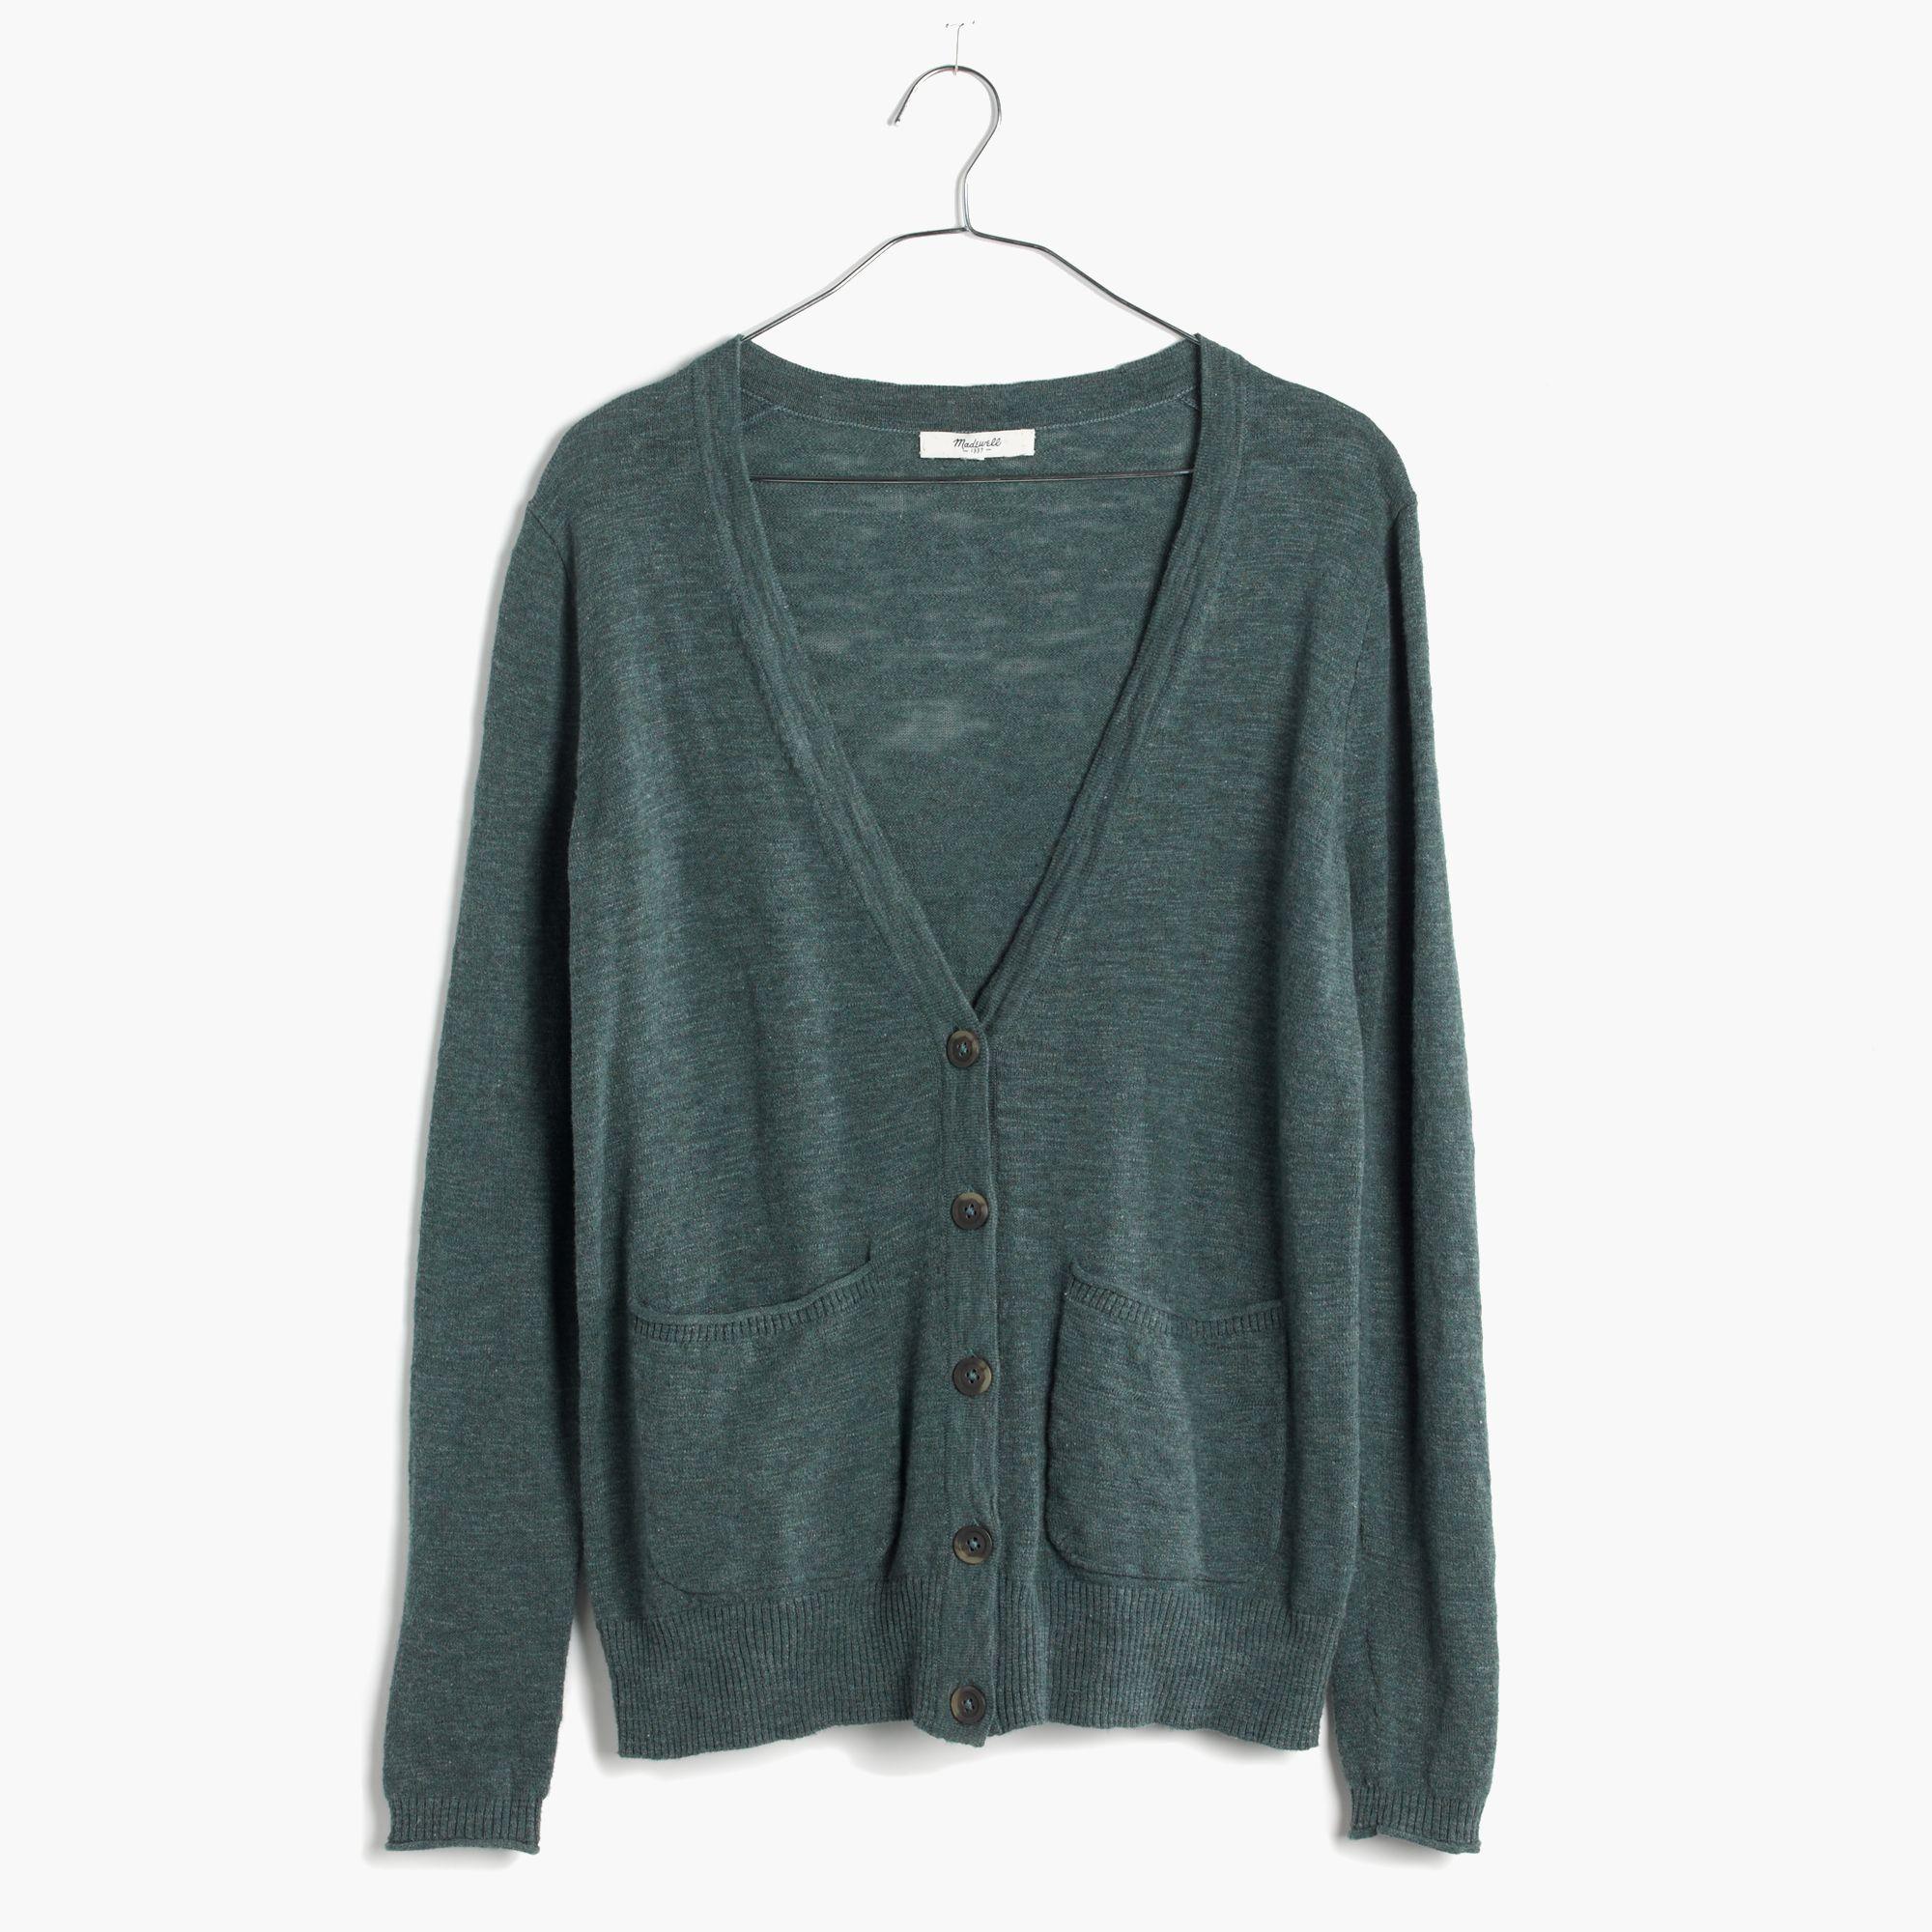 Madewell Graduate Cardigan Sweater in Green | Lyst